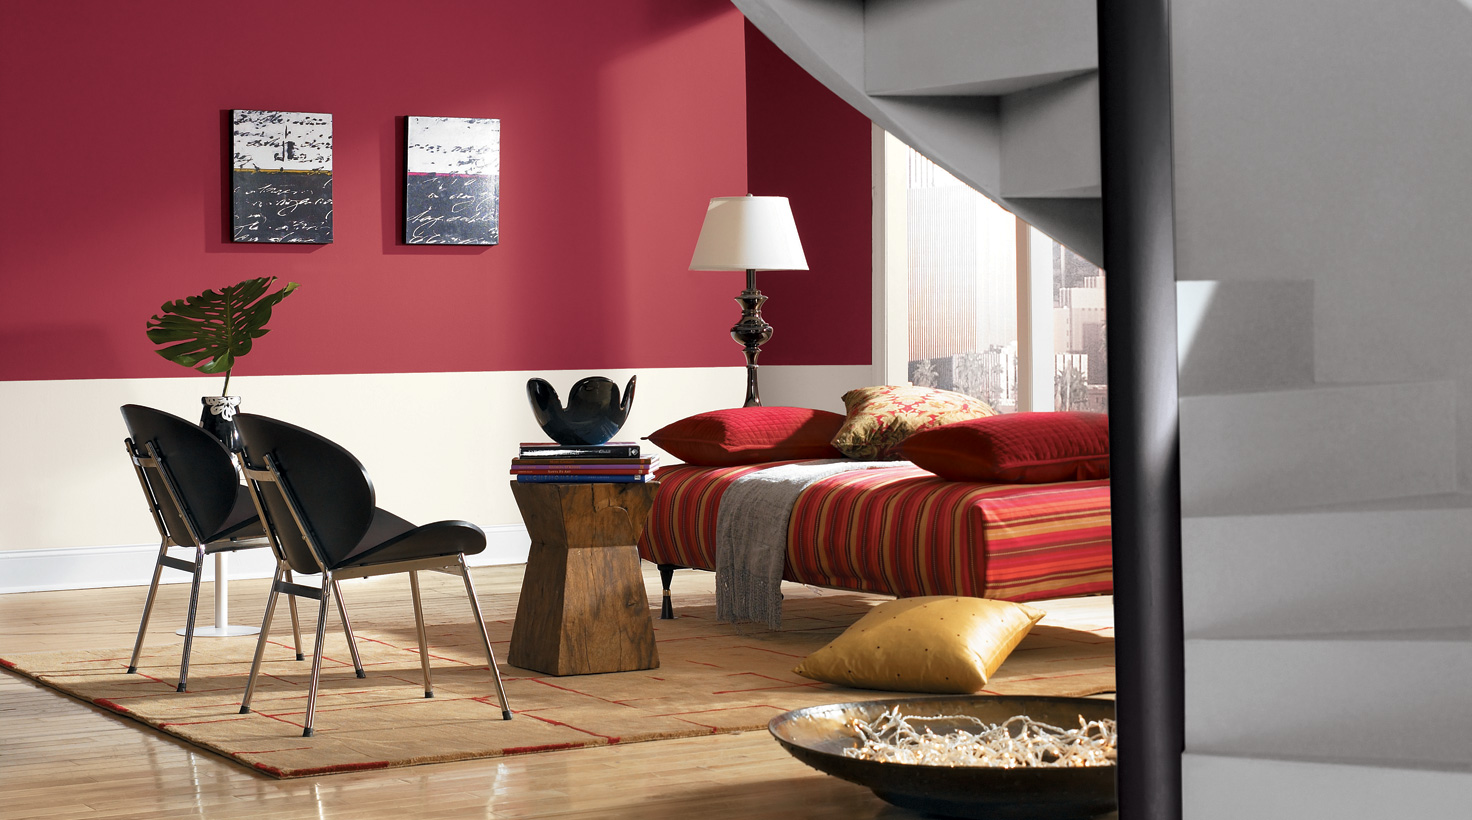 Painting ideas for living room ... living room - red tones ... DHUSKKL